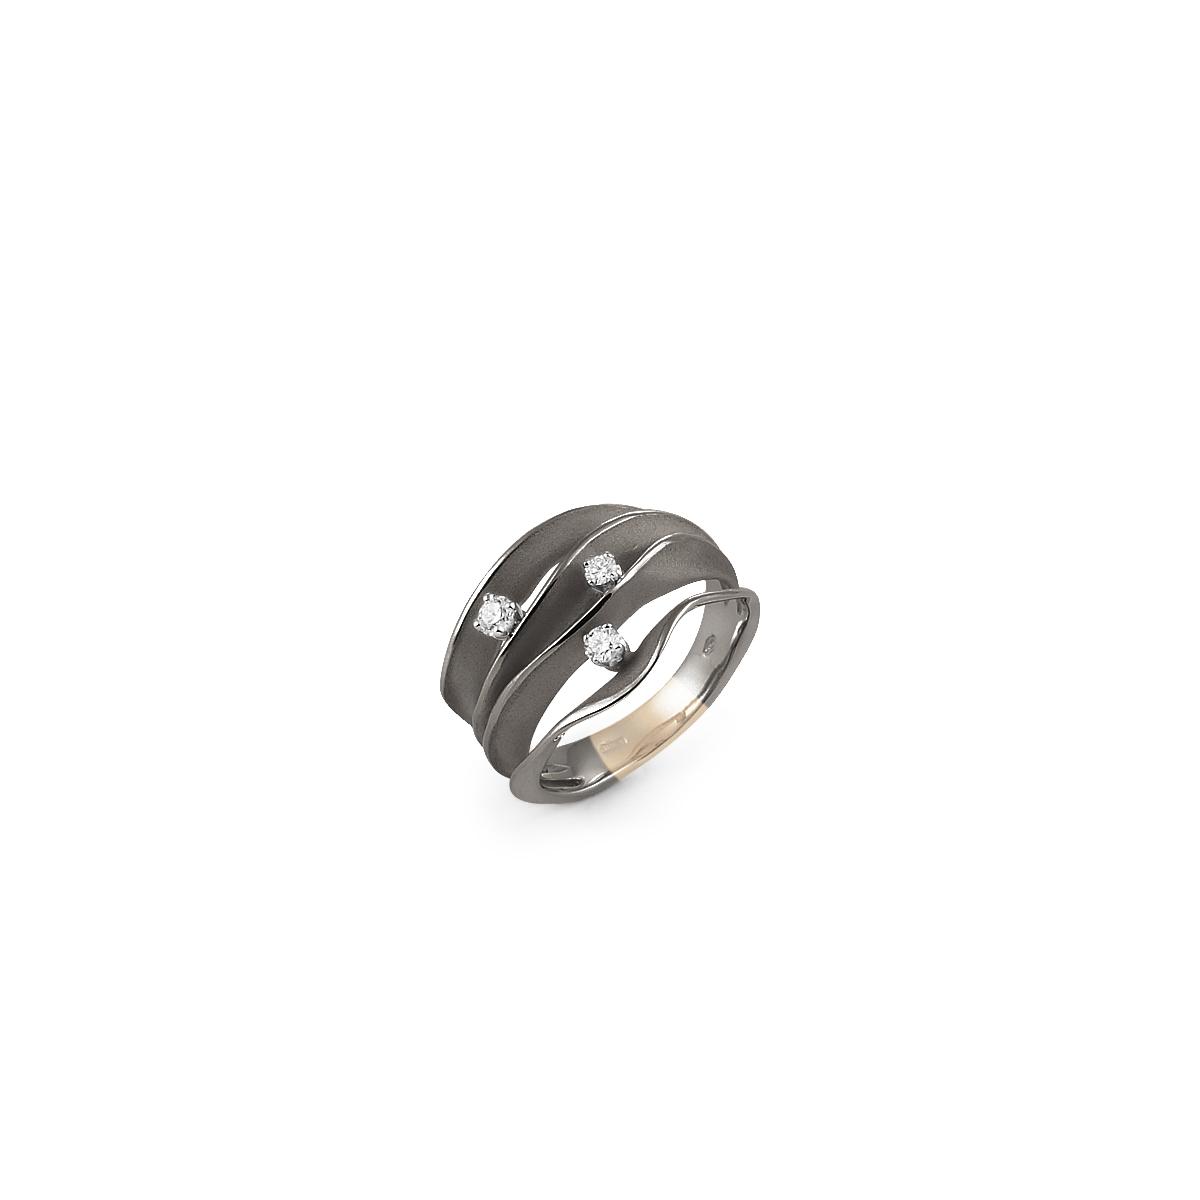 Annamaria Cammilli Dune Ring aus 18 Karat Black Lava Gold mit Brillanten